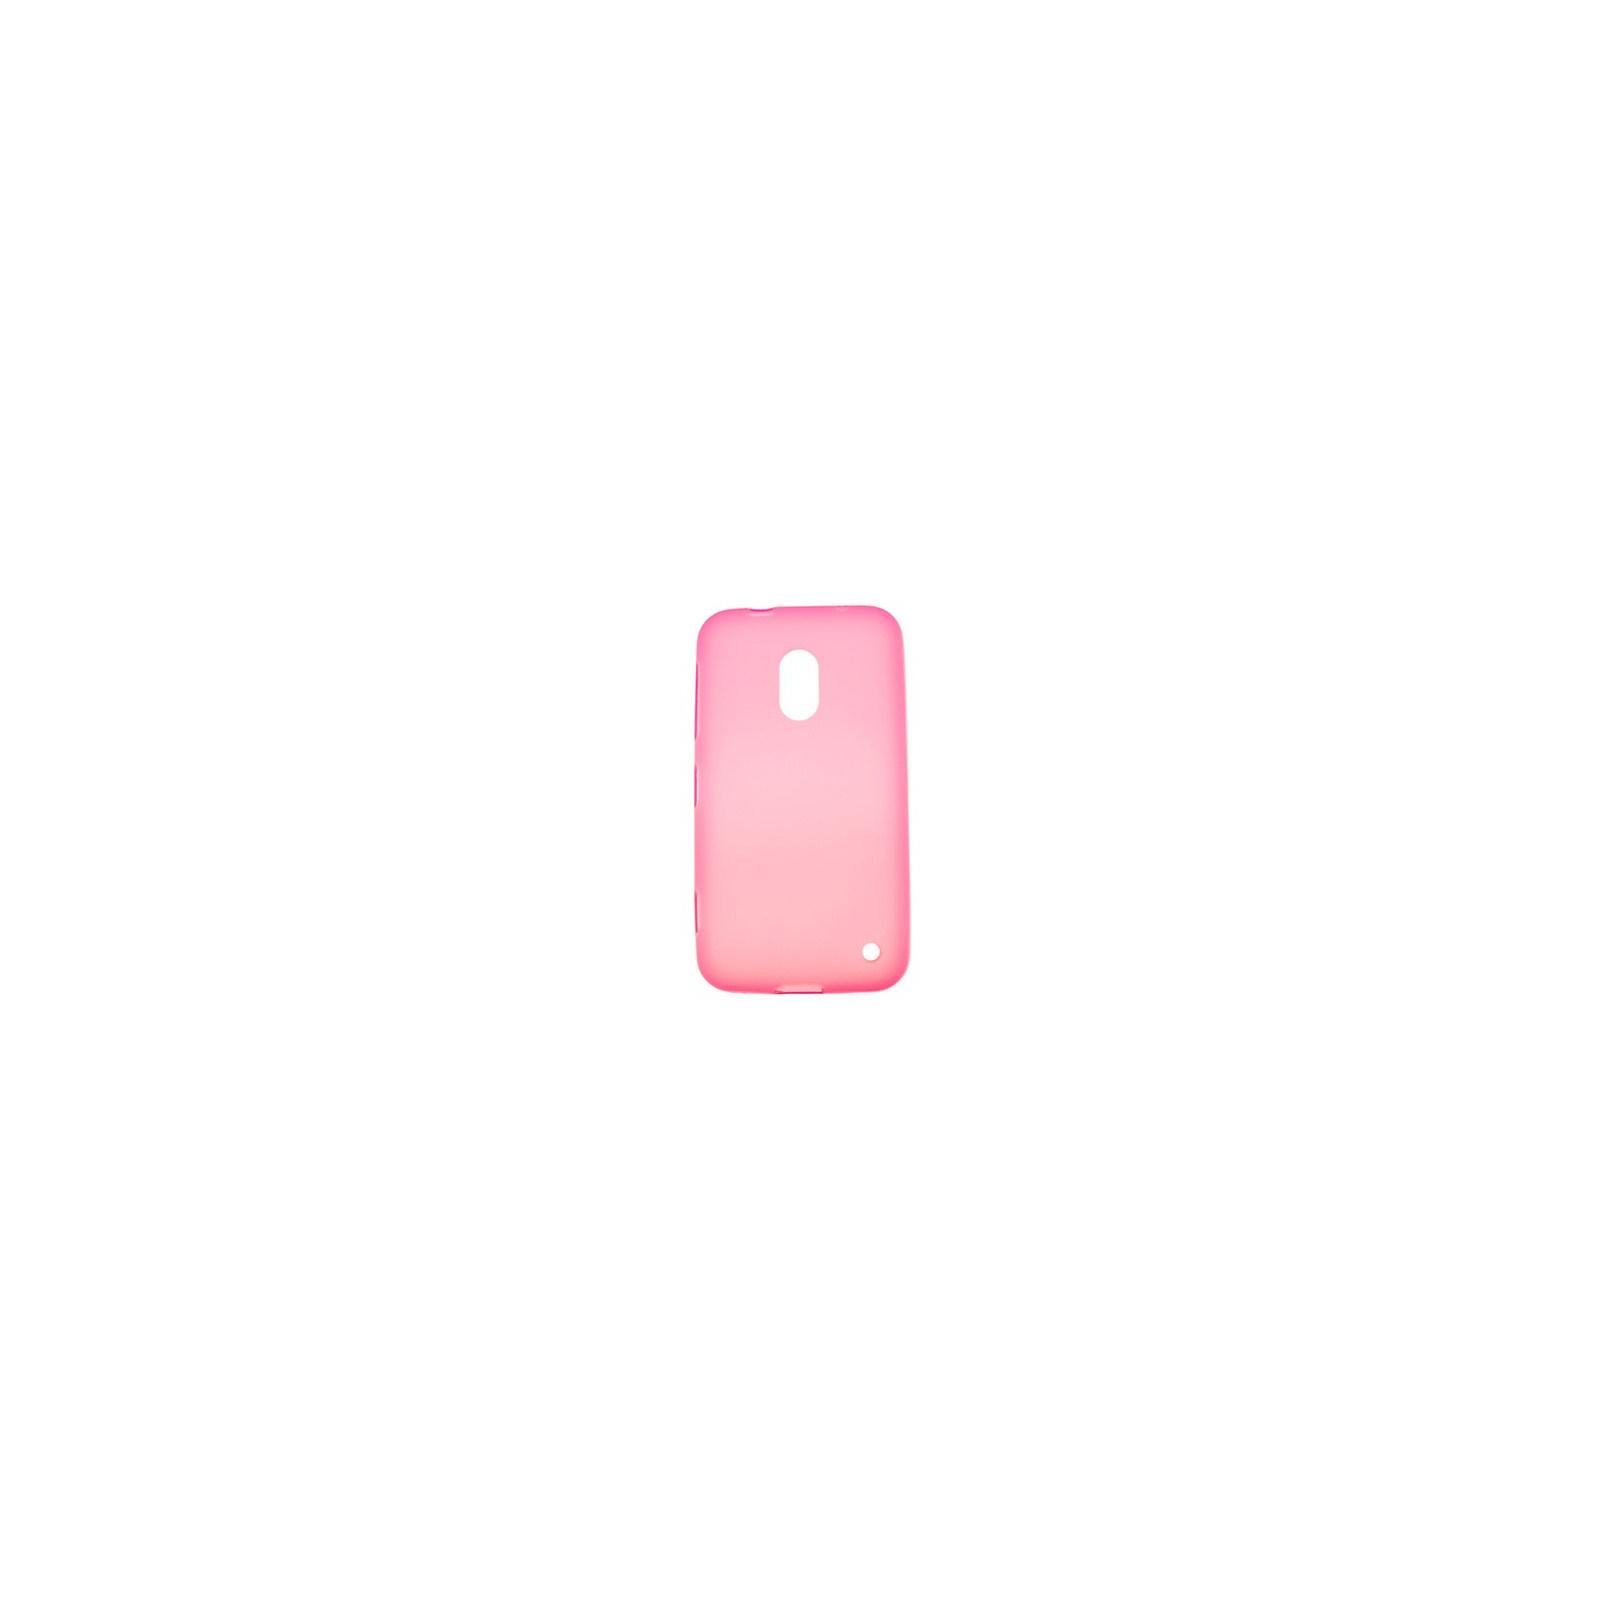 Чехол для моб. телефона Drobak для Nokia 620 Lumia /Elastic PU (216357)